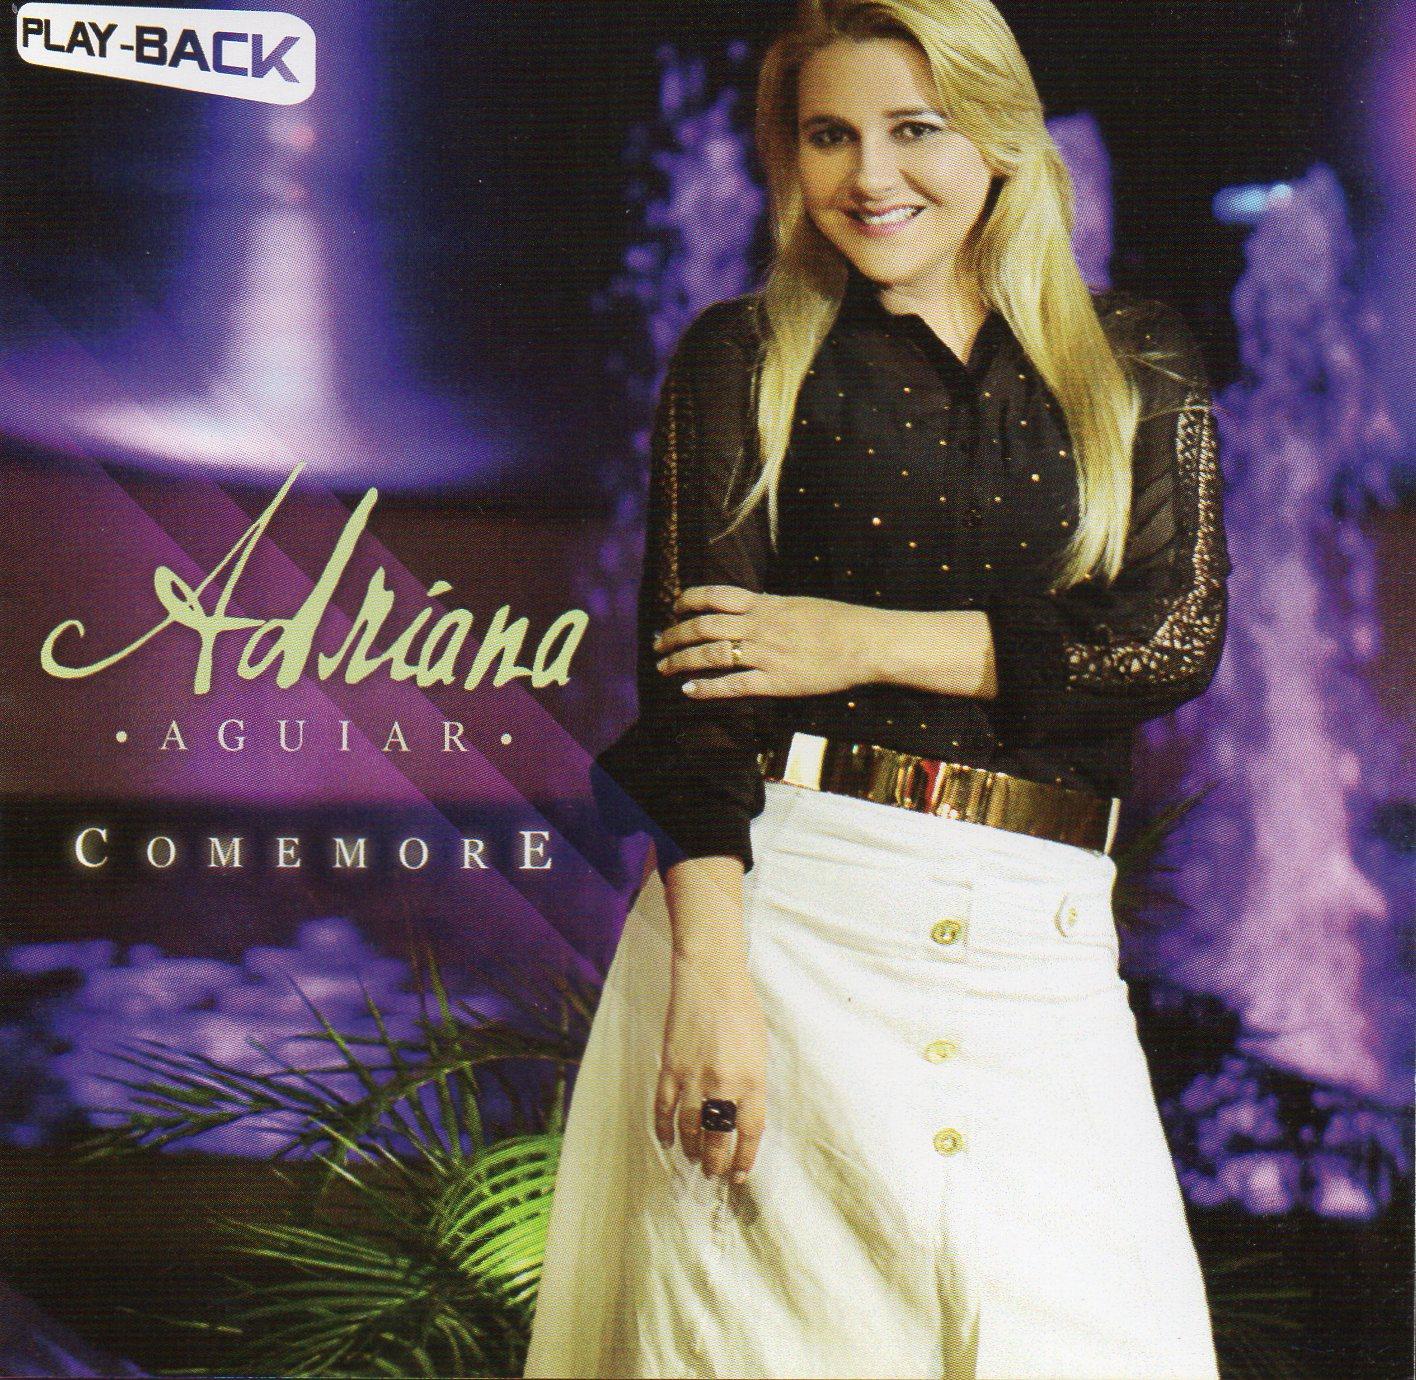 Adriana Aguiar - Comemore - Playback